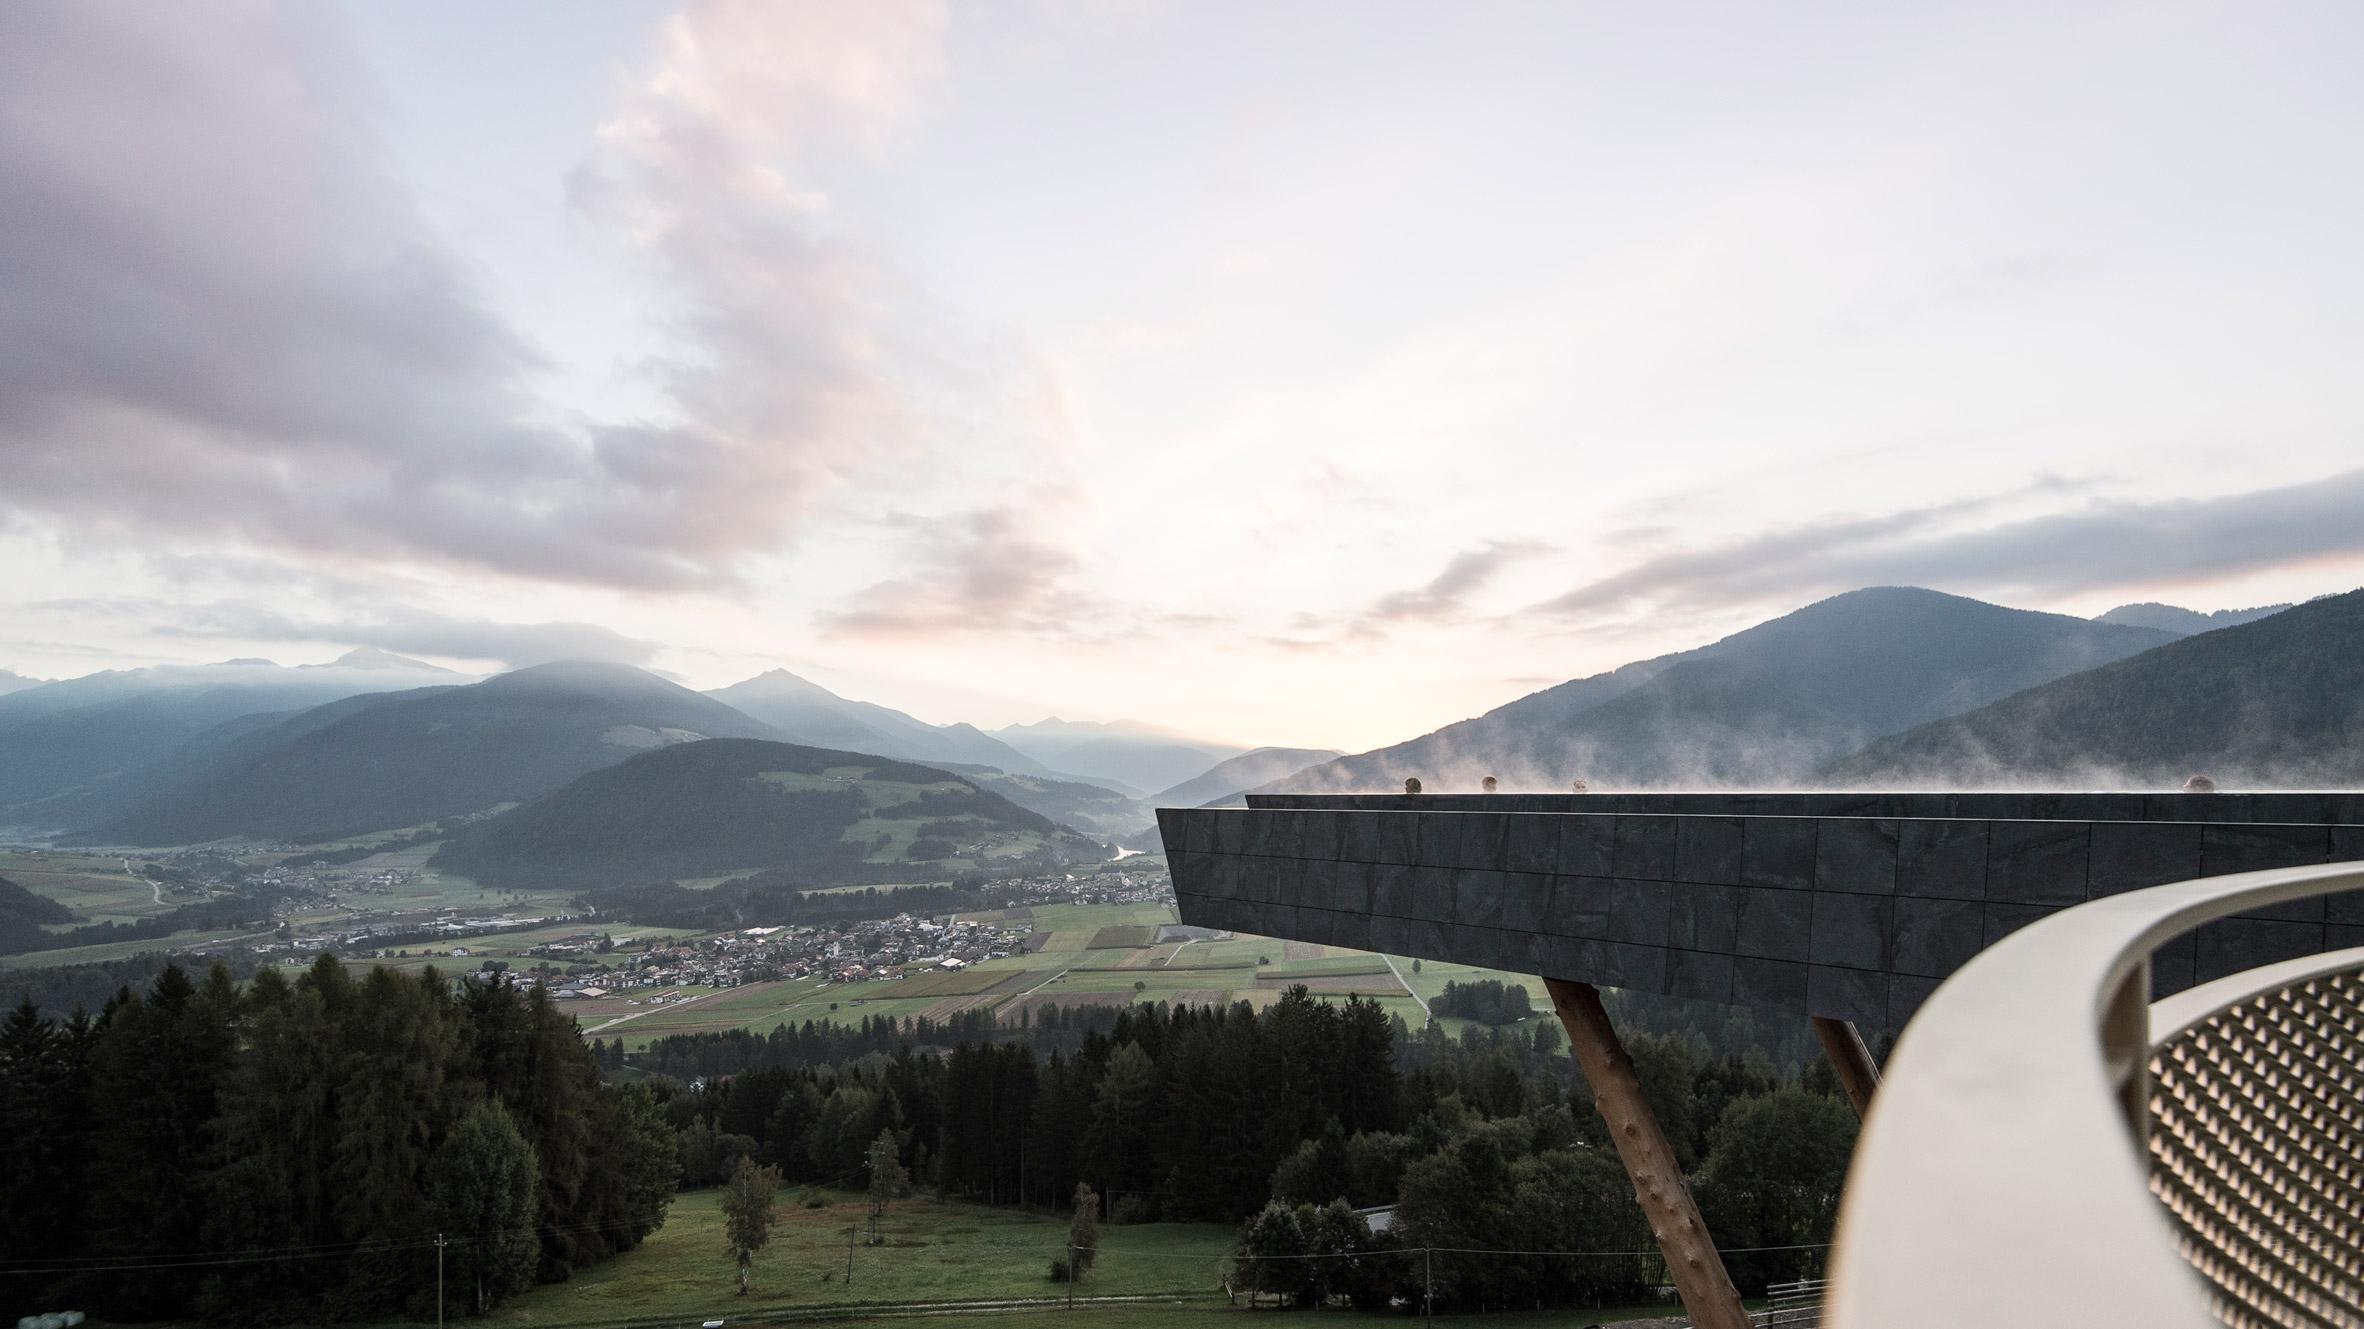 cantilevered-sky-pool-noa-hotel-hubertus-dolomites-italian-alps_dezeen_2364_col_5